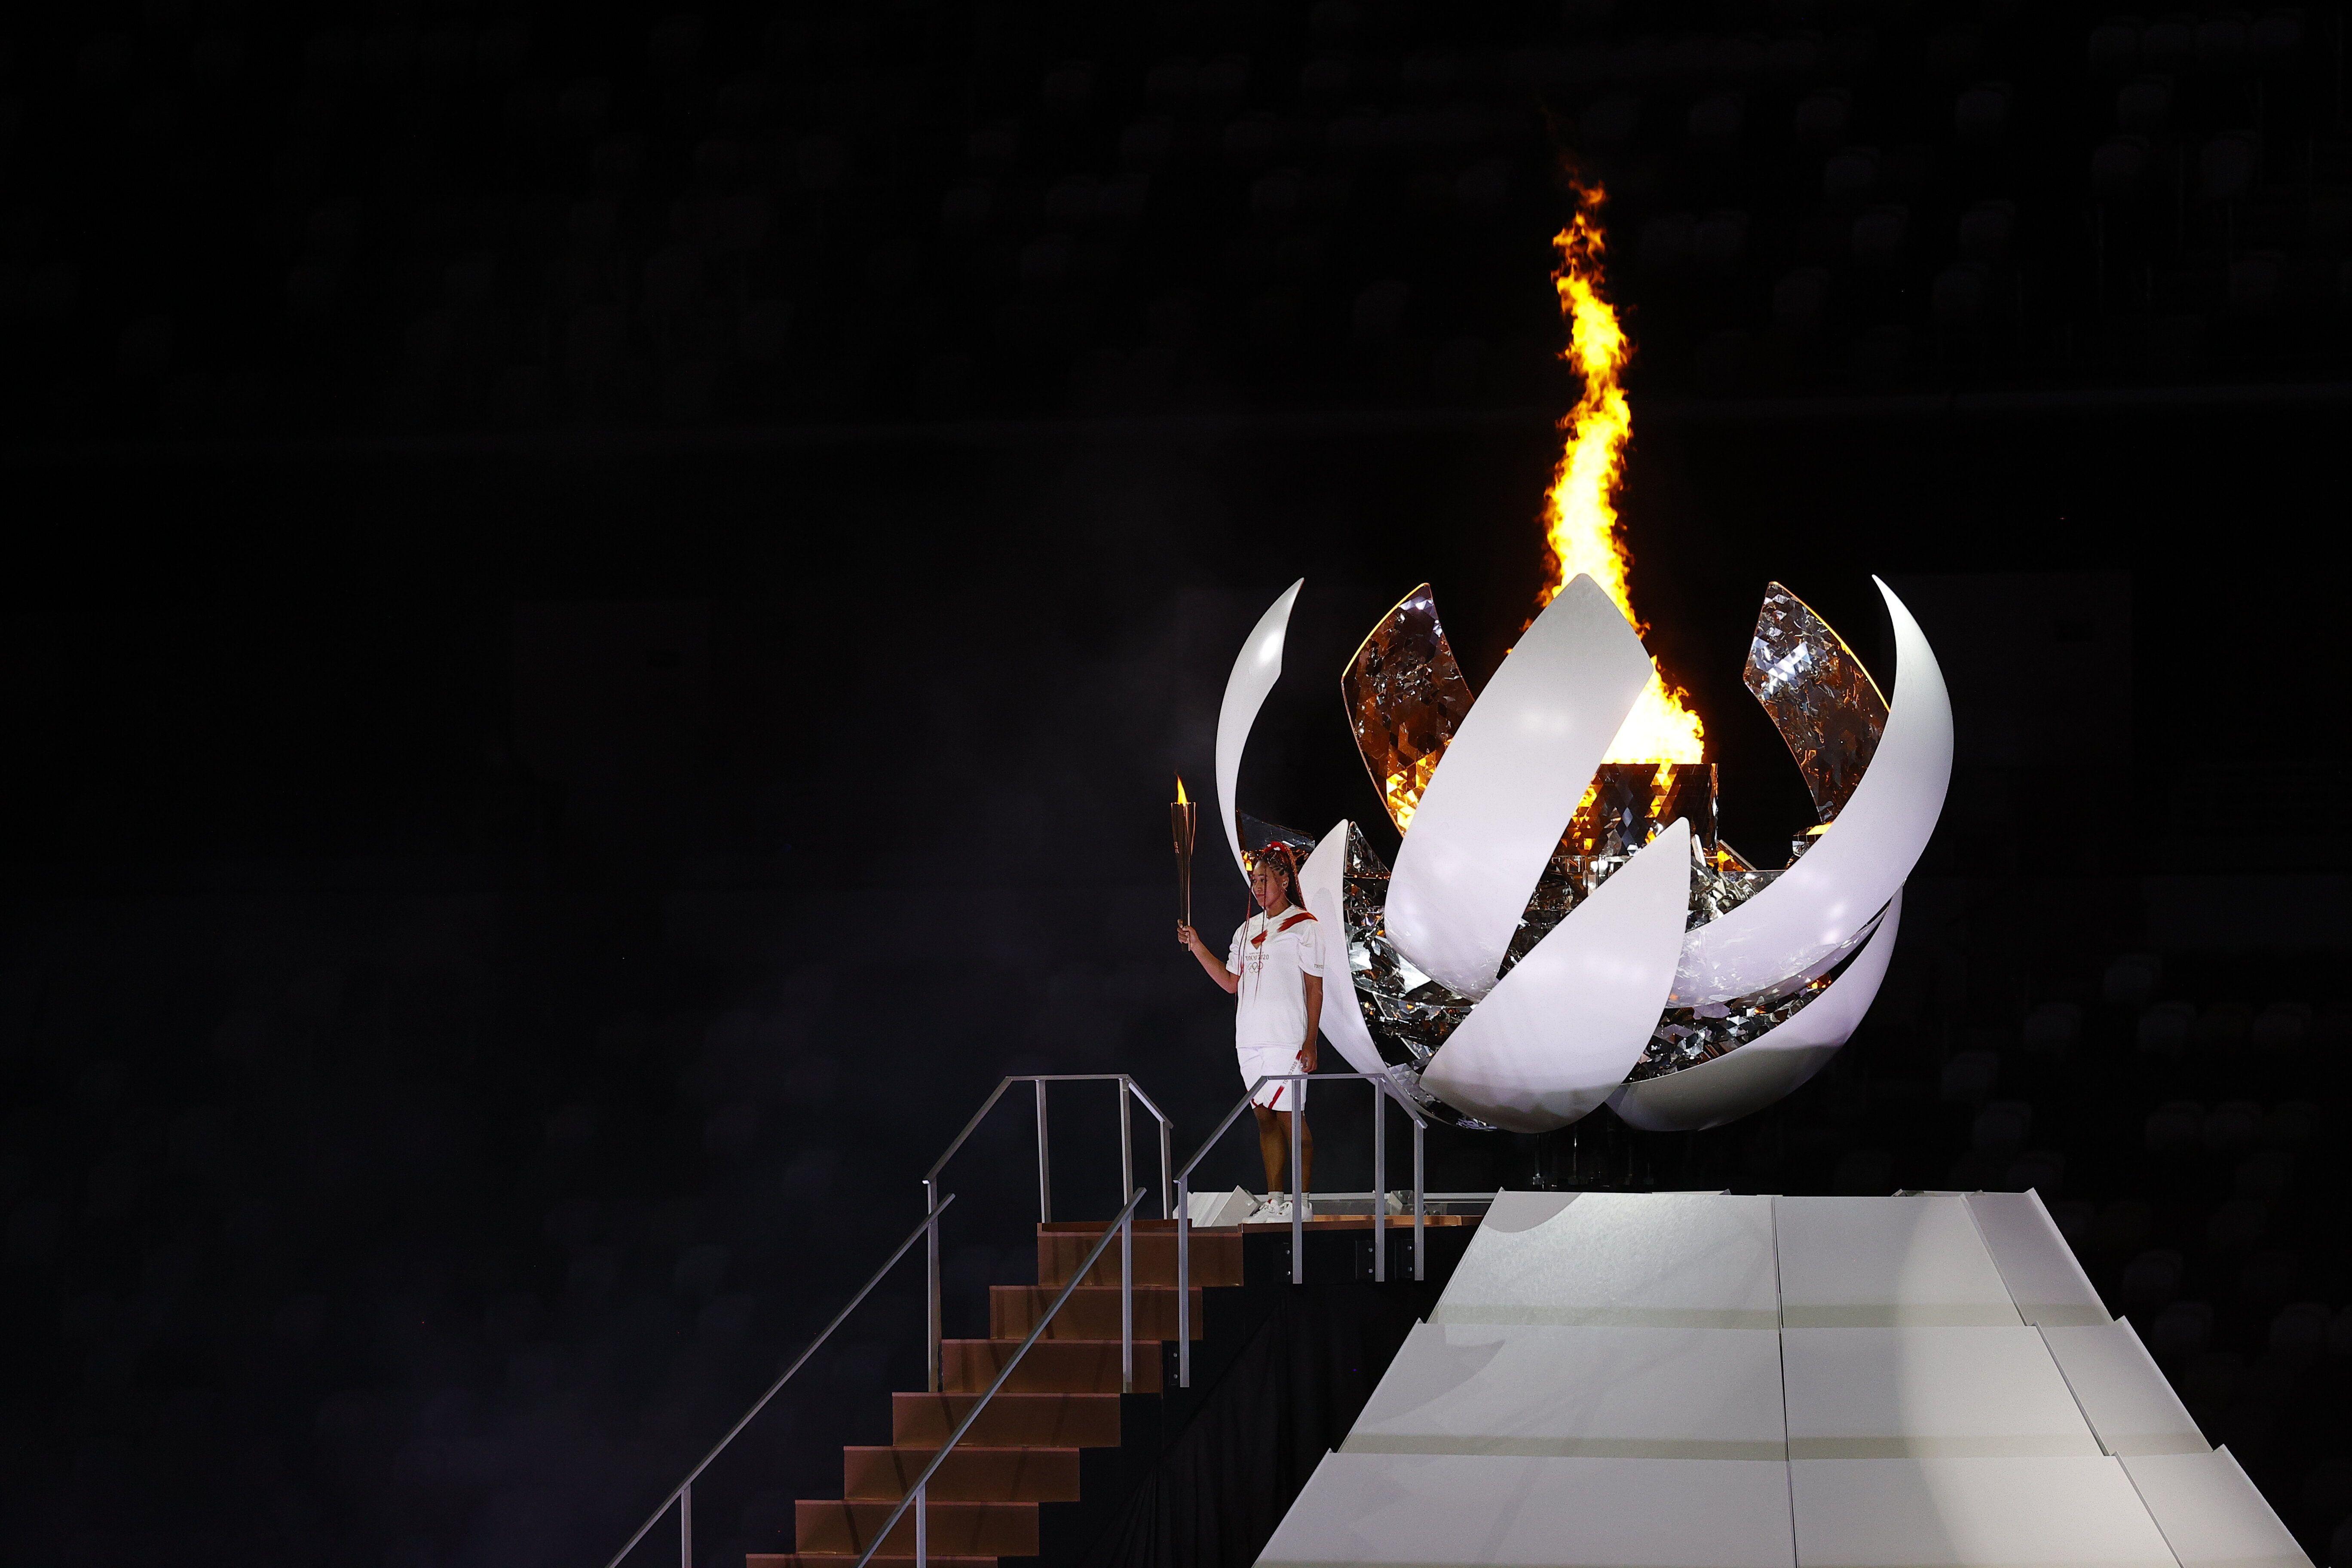 The Olympic Cauldron is lit.